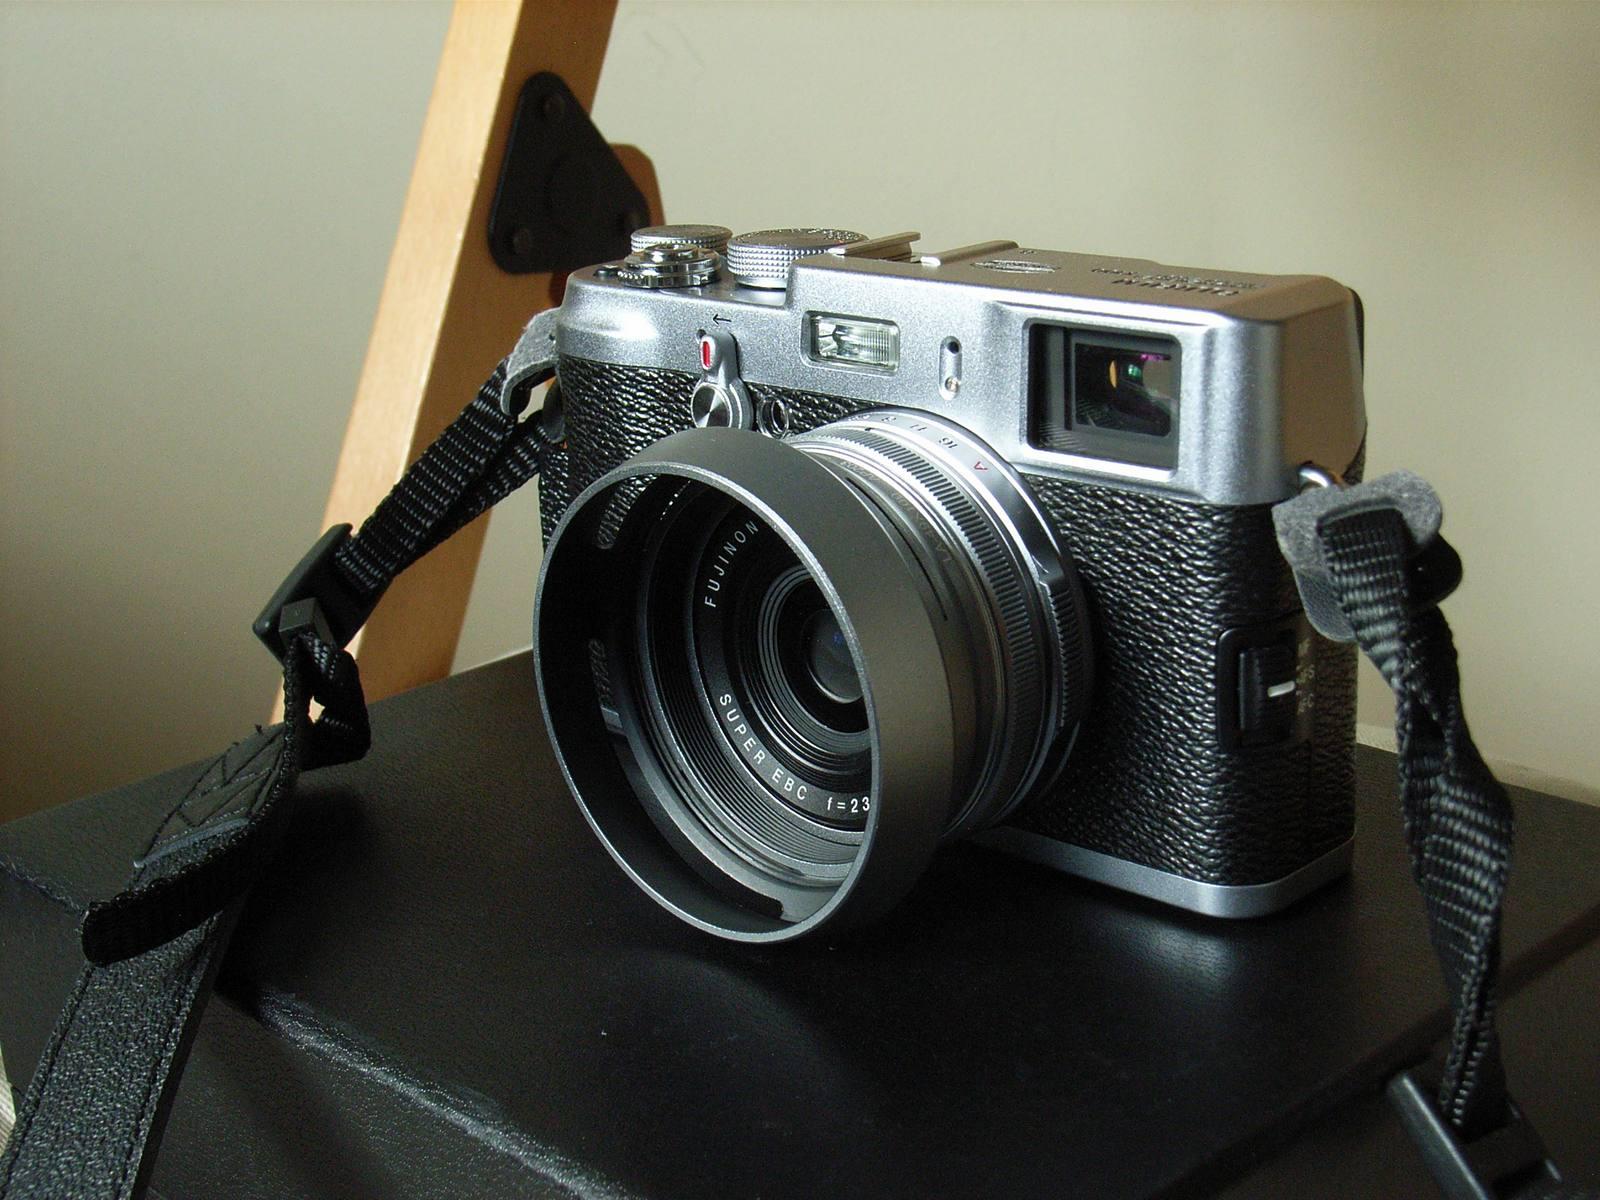 File:Fujifilm FinePix X100.jpg